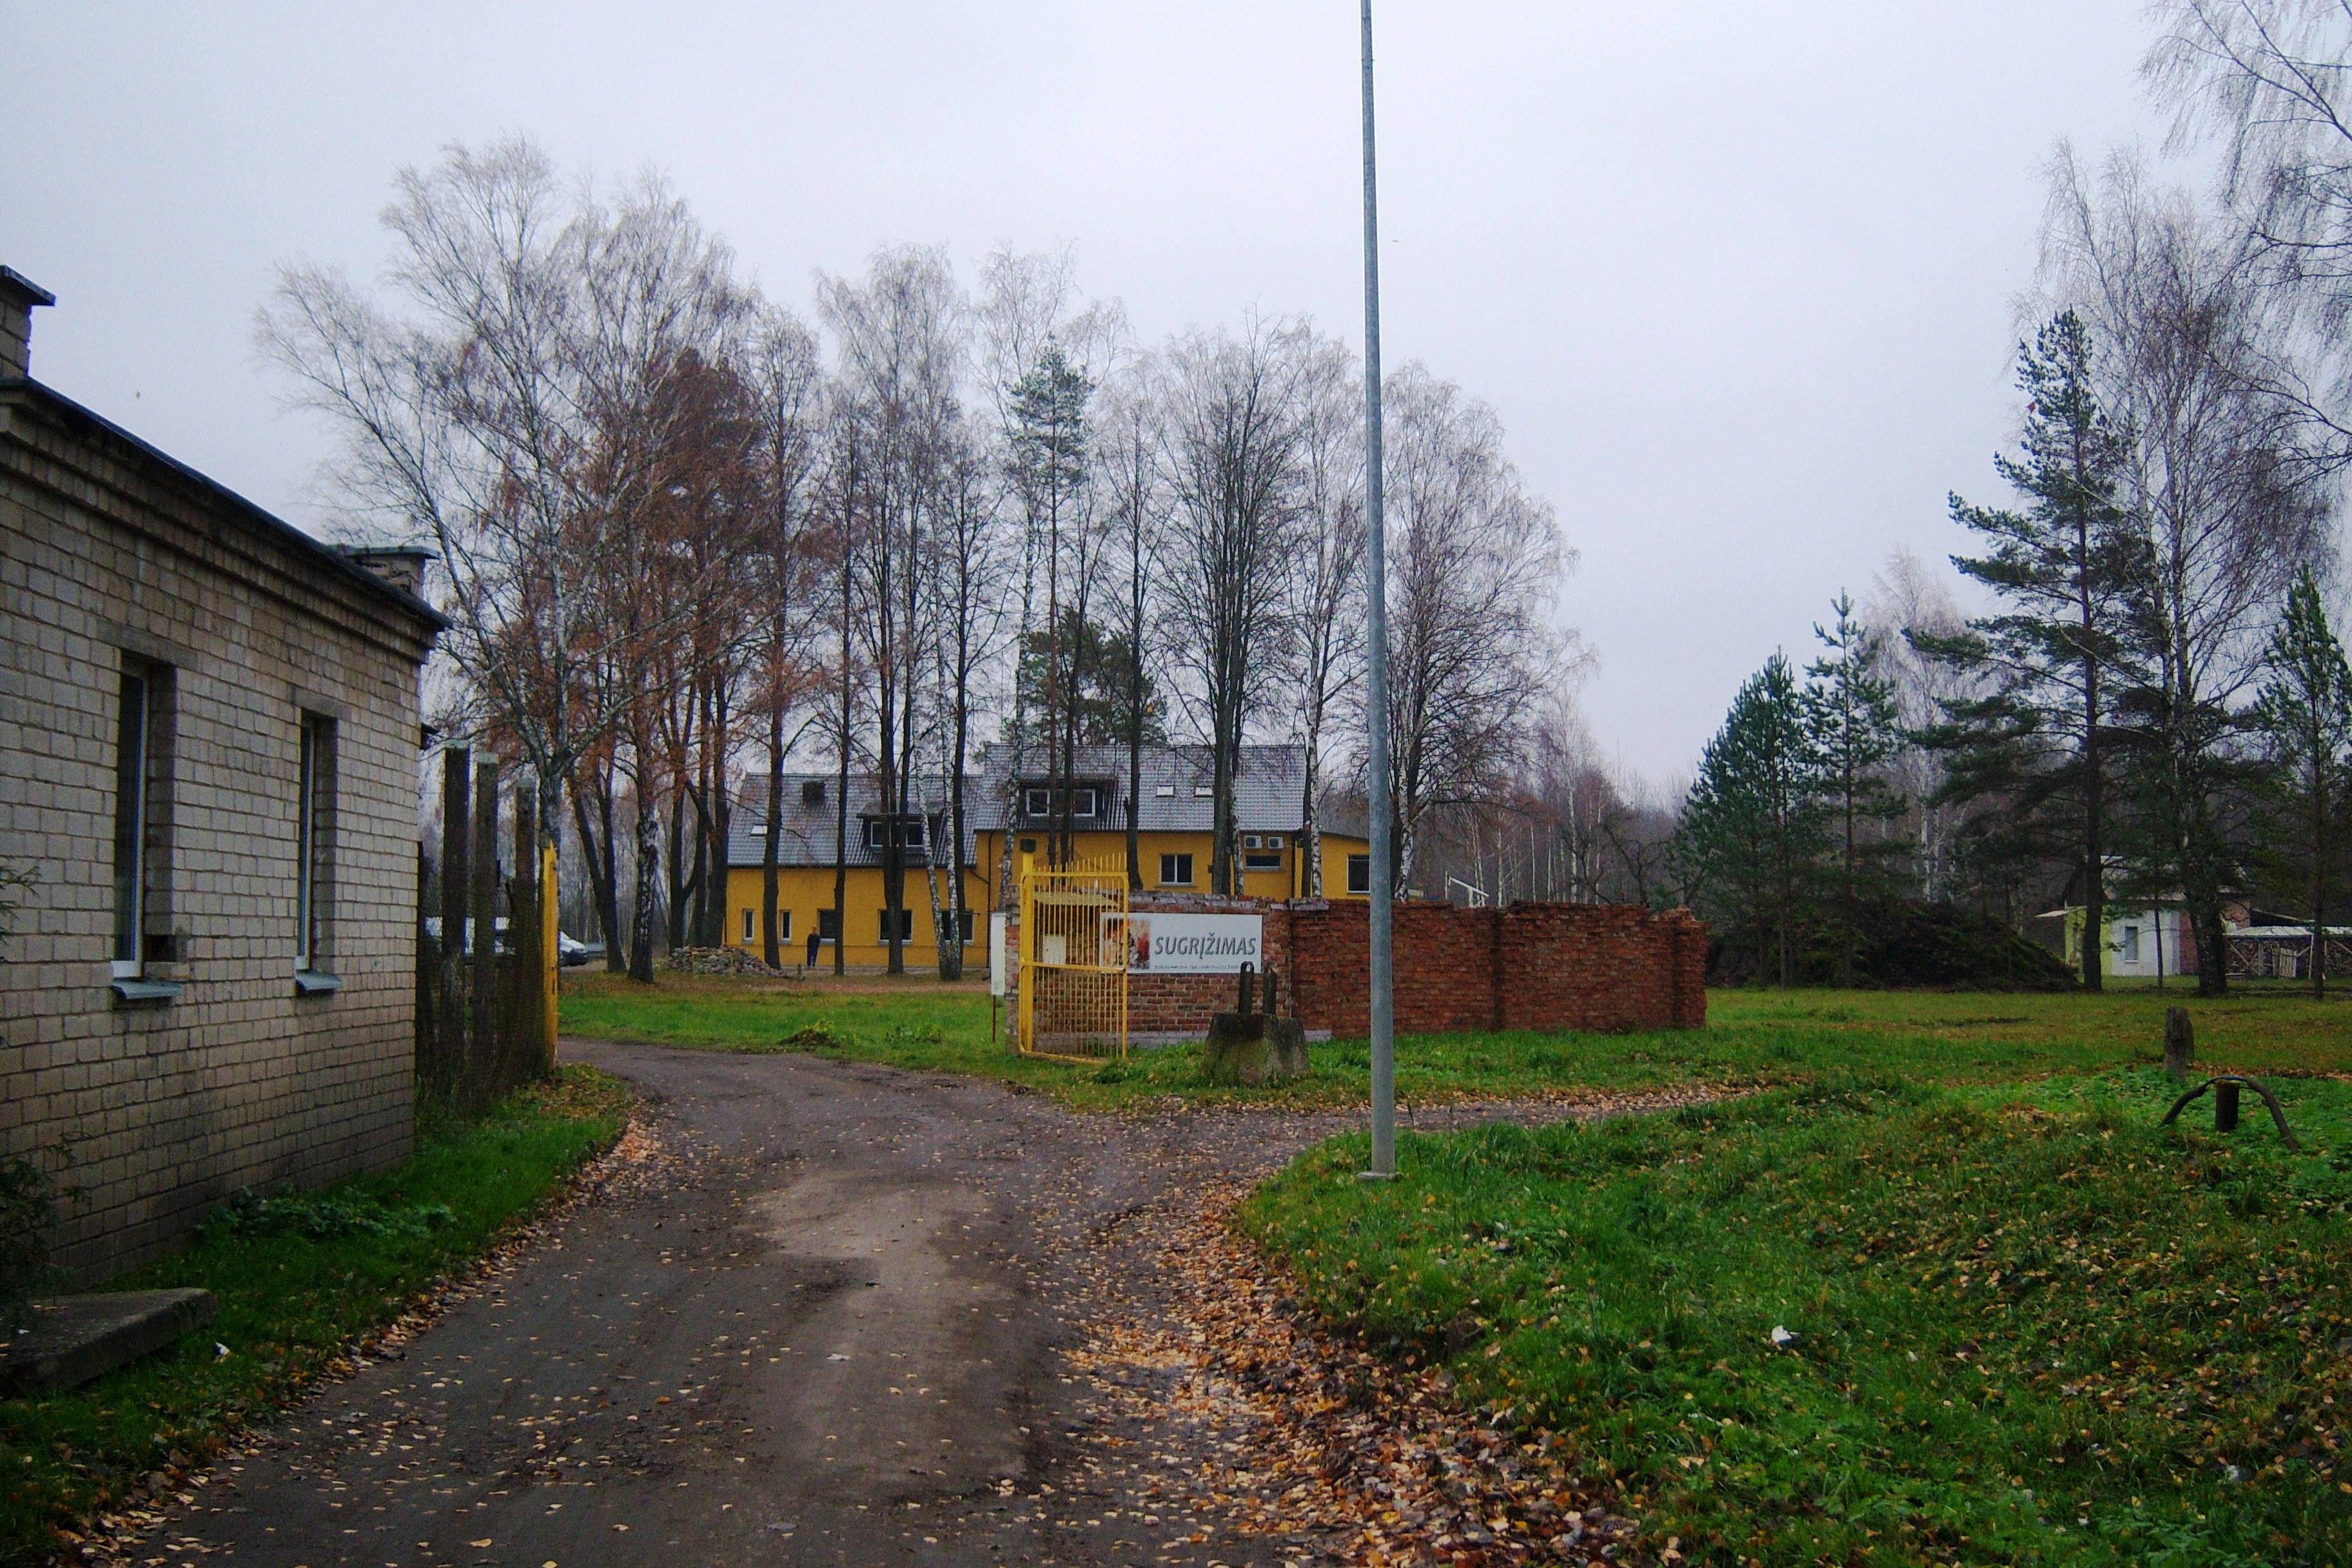 File:Linksmakalnis. Narkomanų reabilitacijos centras.JPG